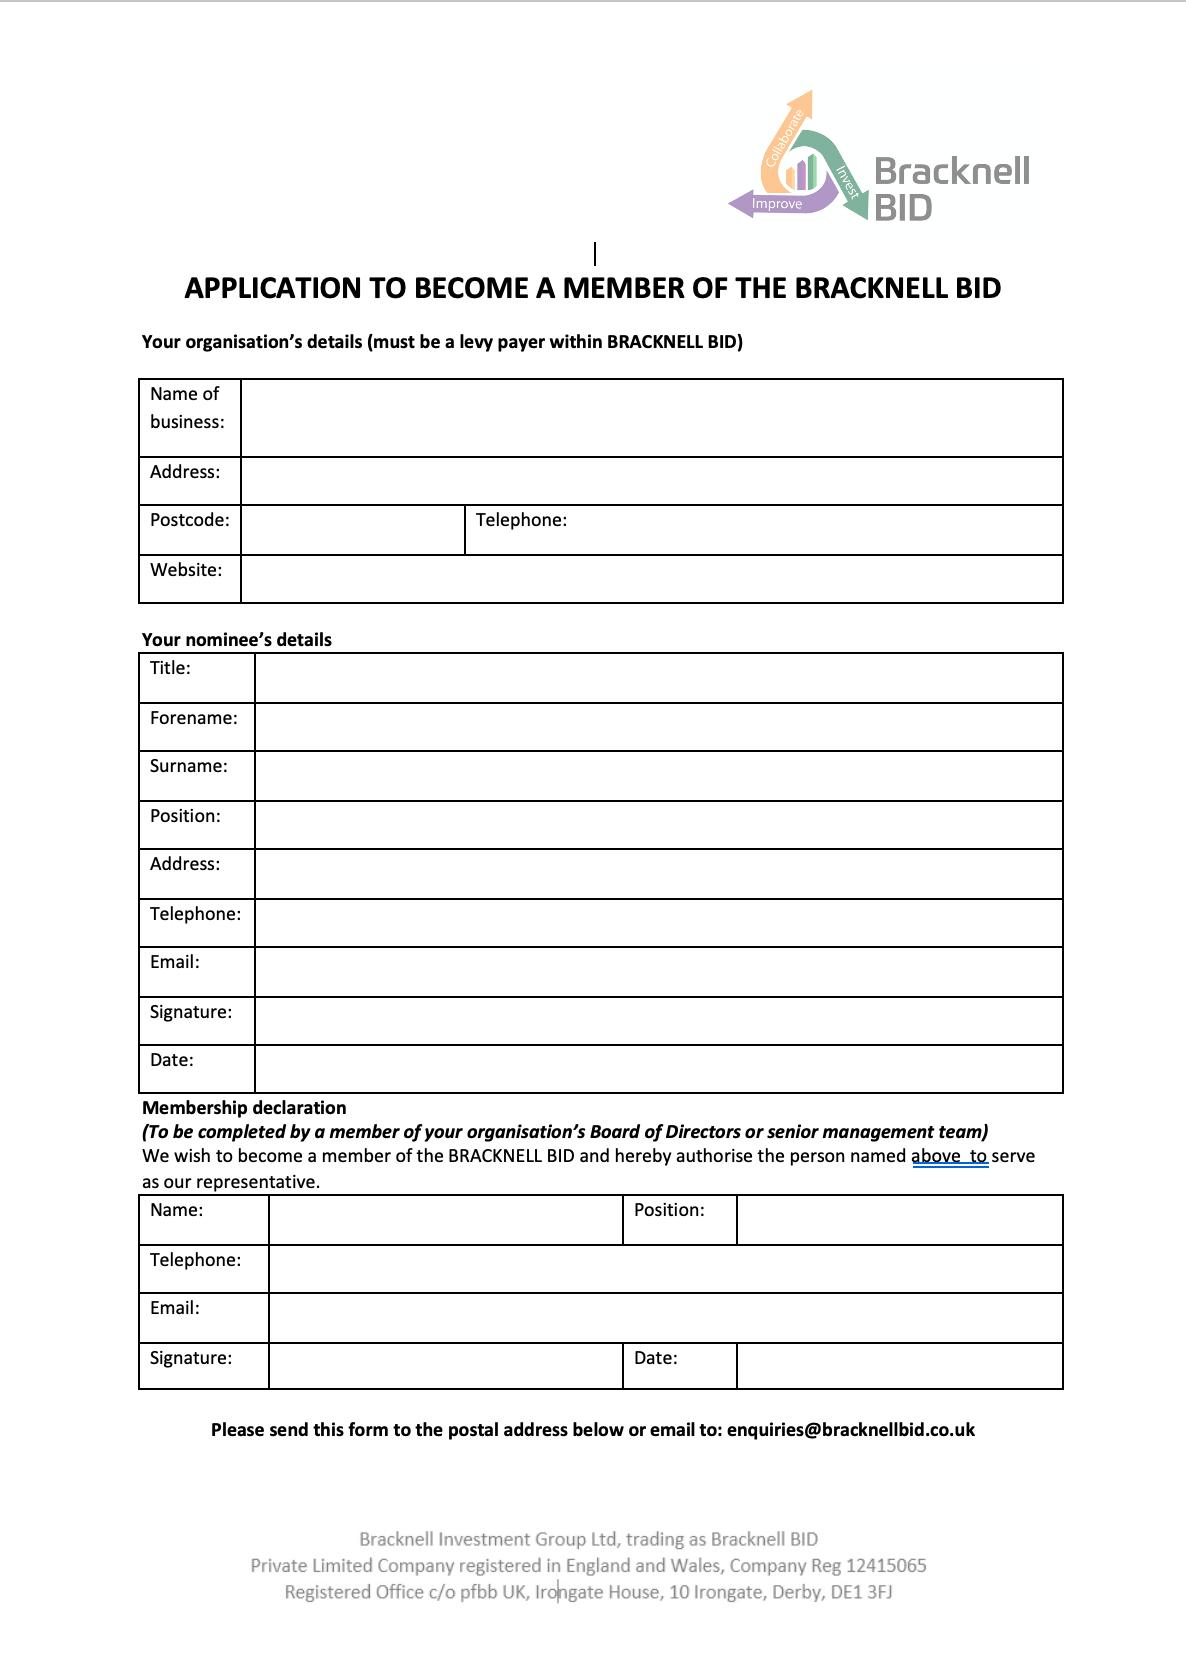 bracknell-bid-application-form-for-membership